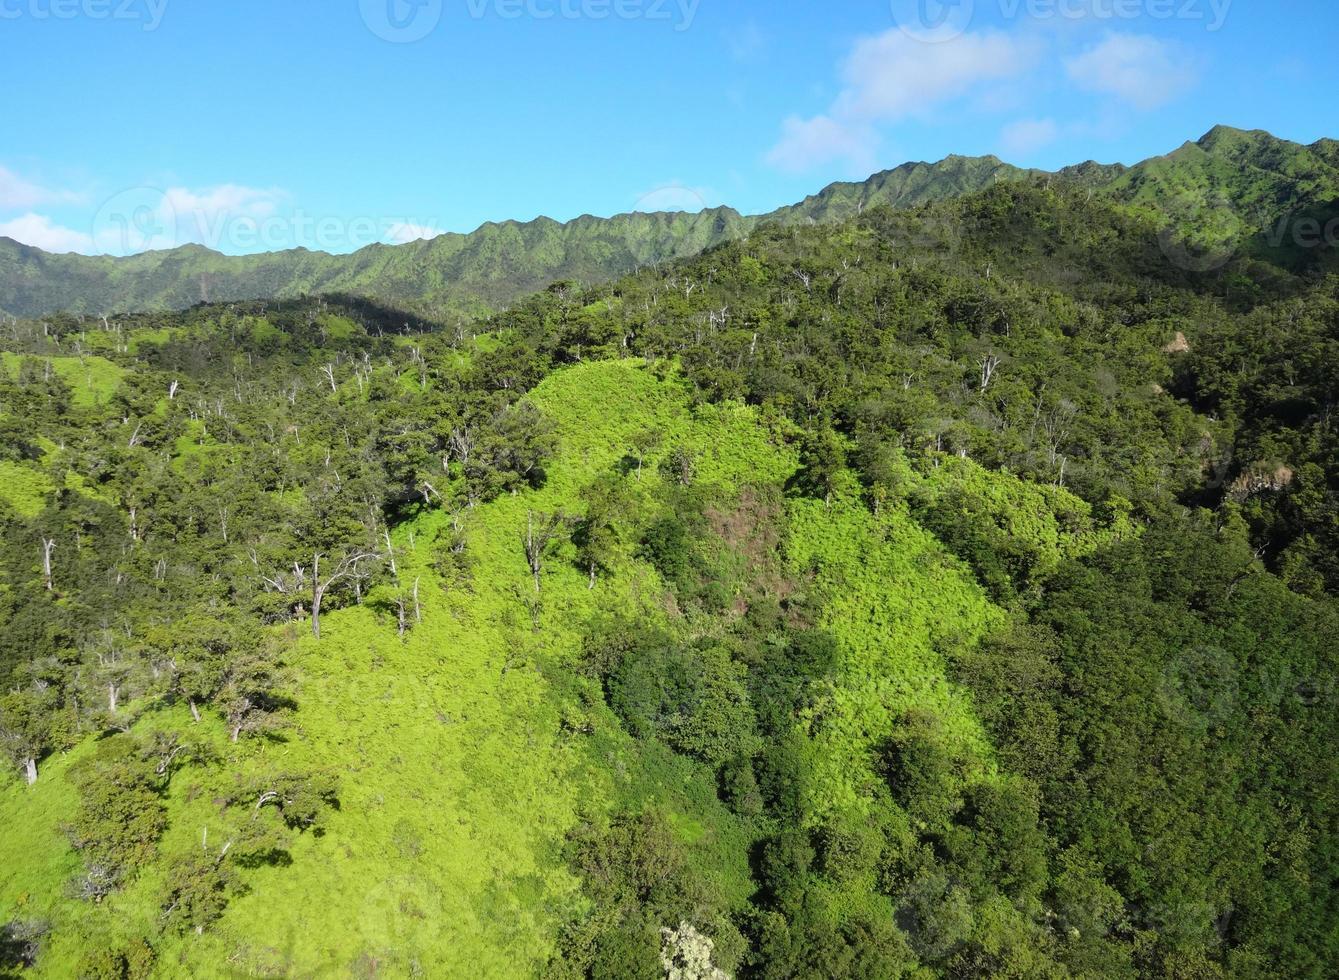 verts de kauai photo